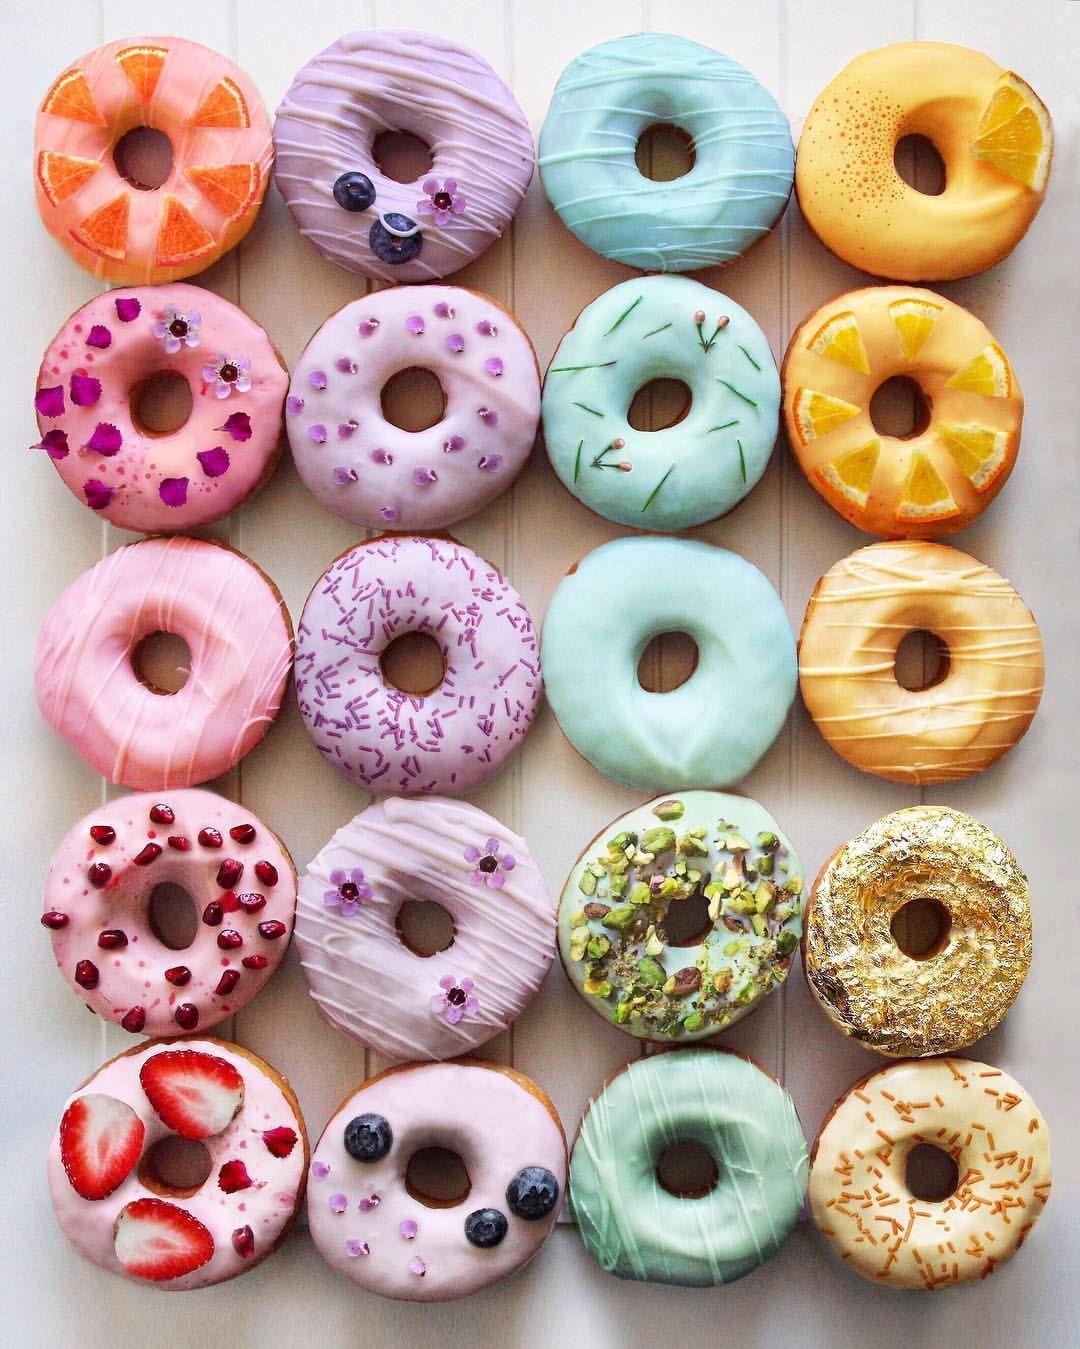 Pastel Donut Backgrounds